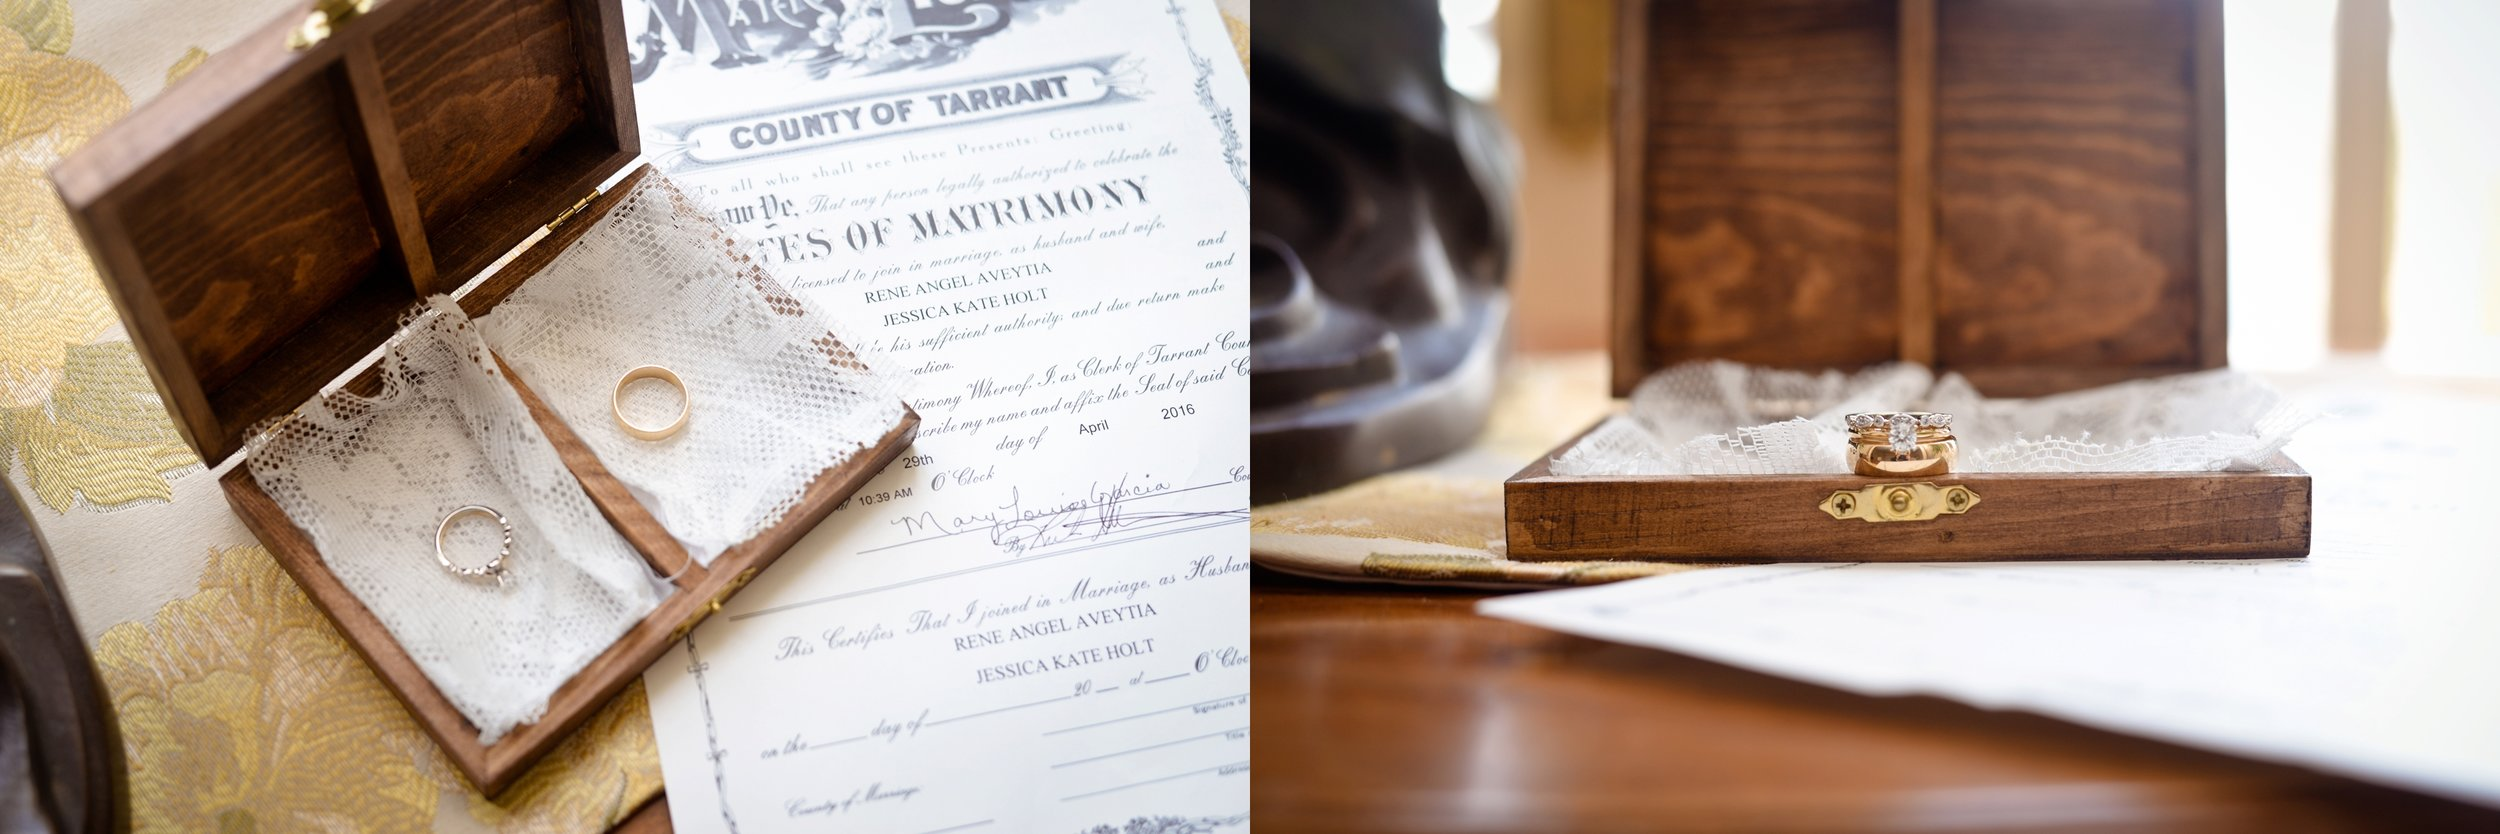 Lonestar-Mansion-Fort-Worth-Wedding-Planner-Burleson-Wedding-Venue_02.jpg